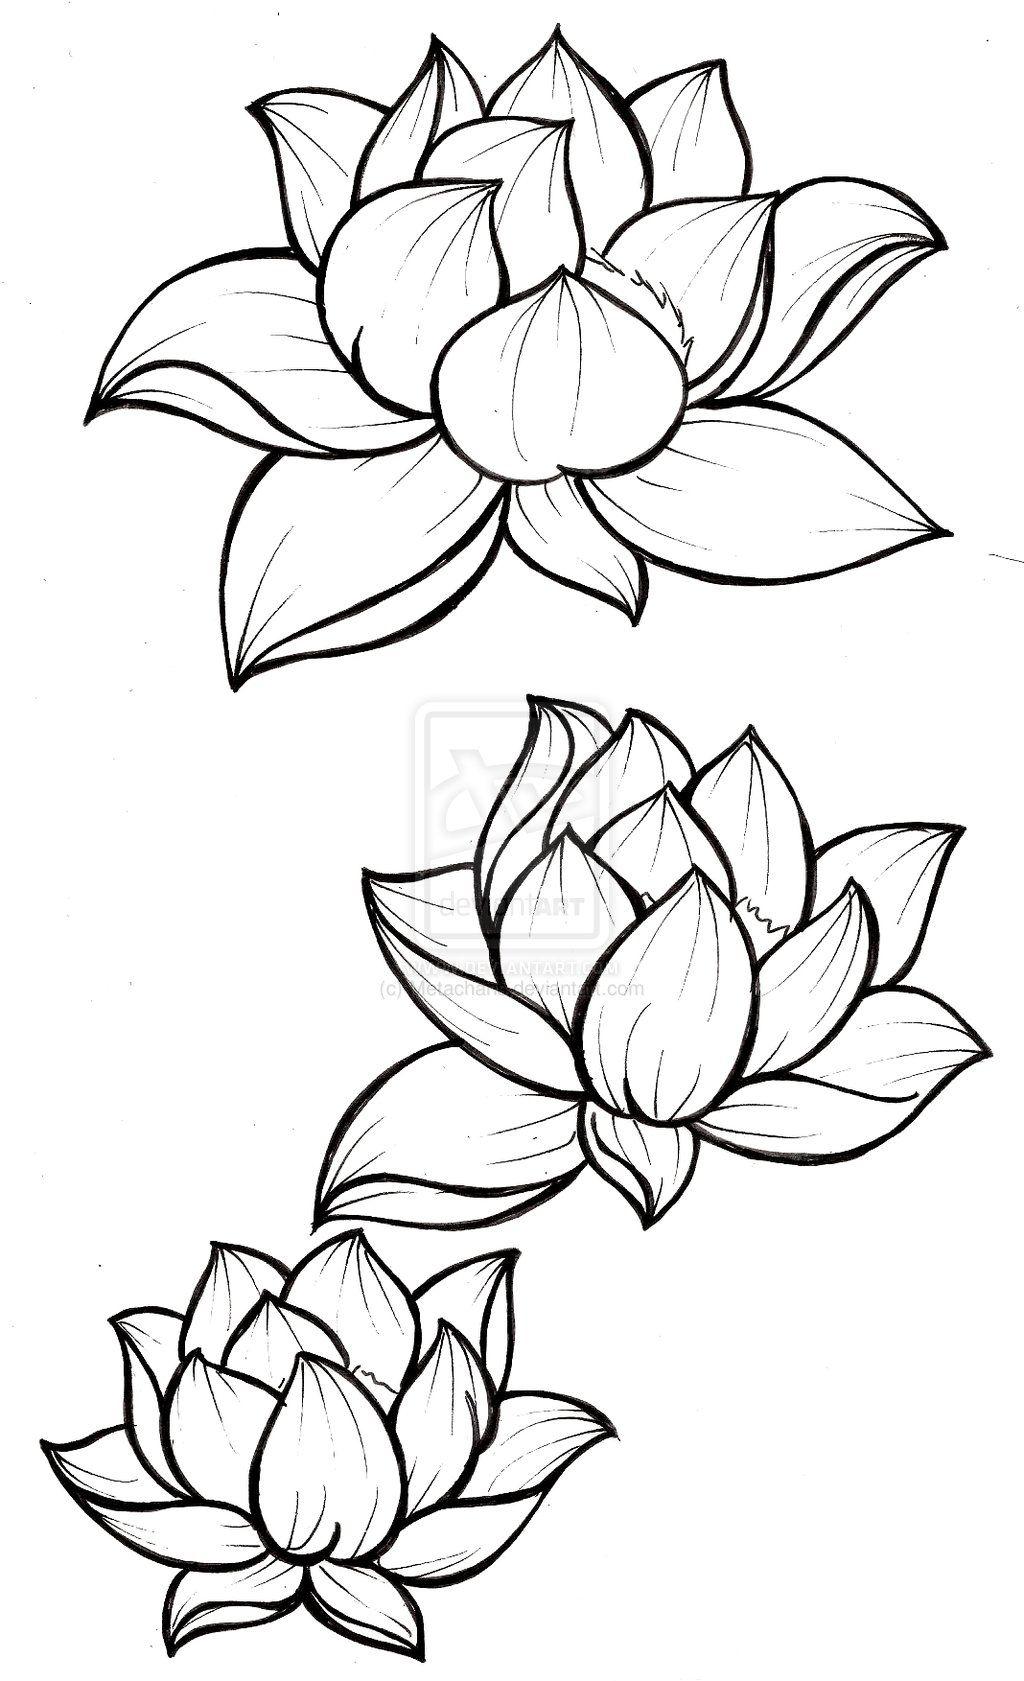 Lotus Blossom Tattoo by Metacharisviantart on deviantART